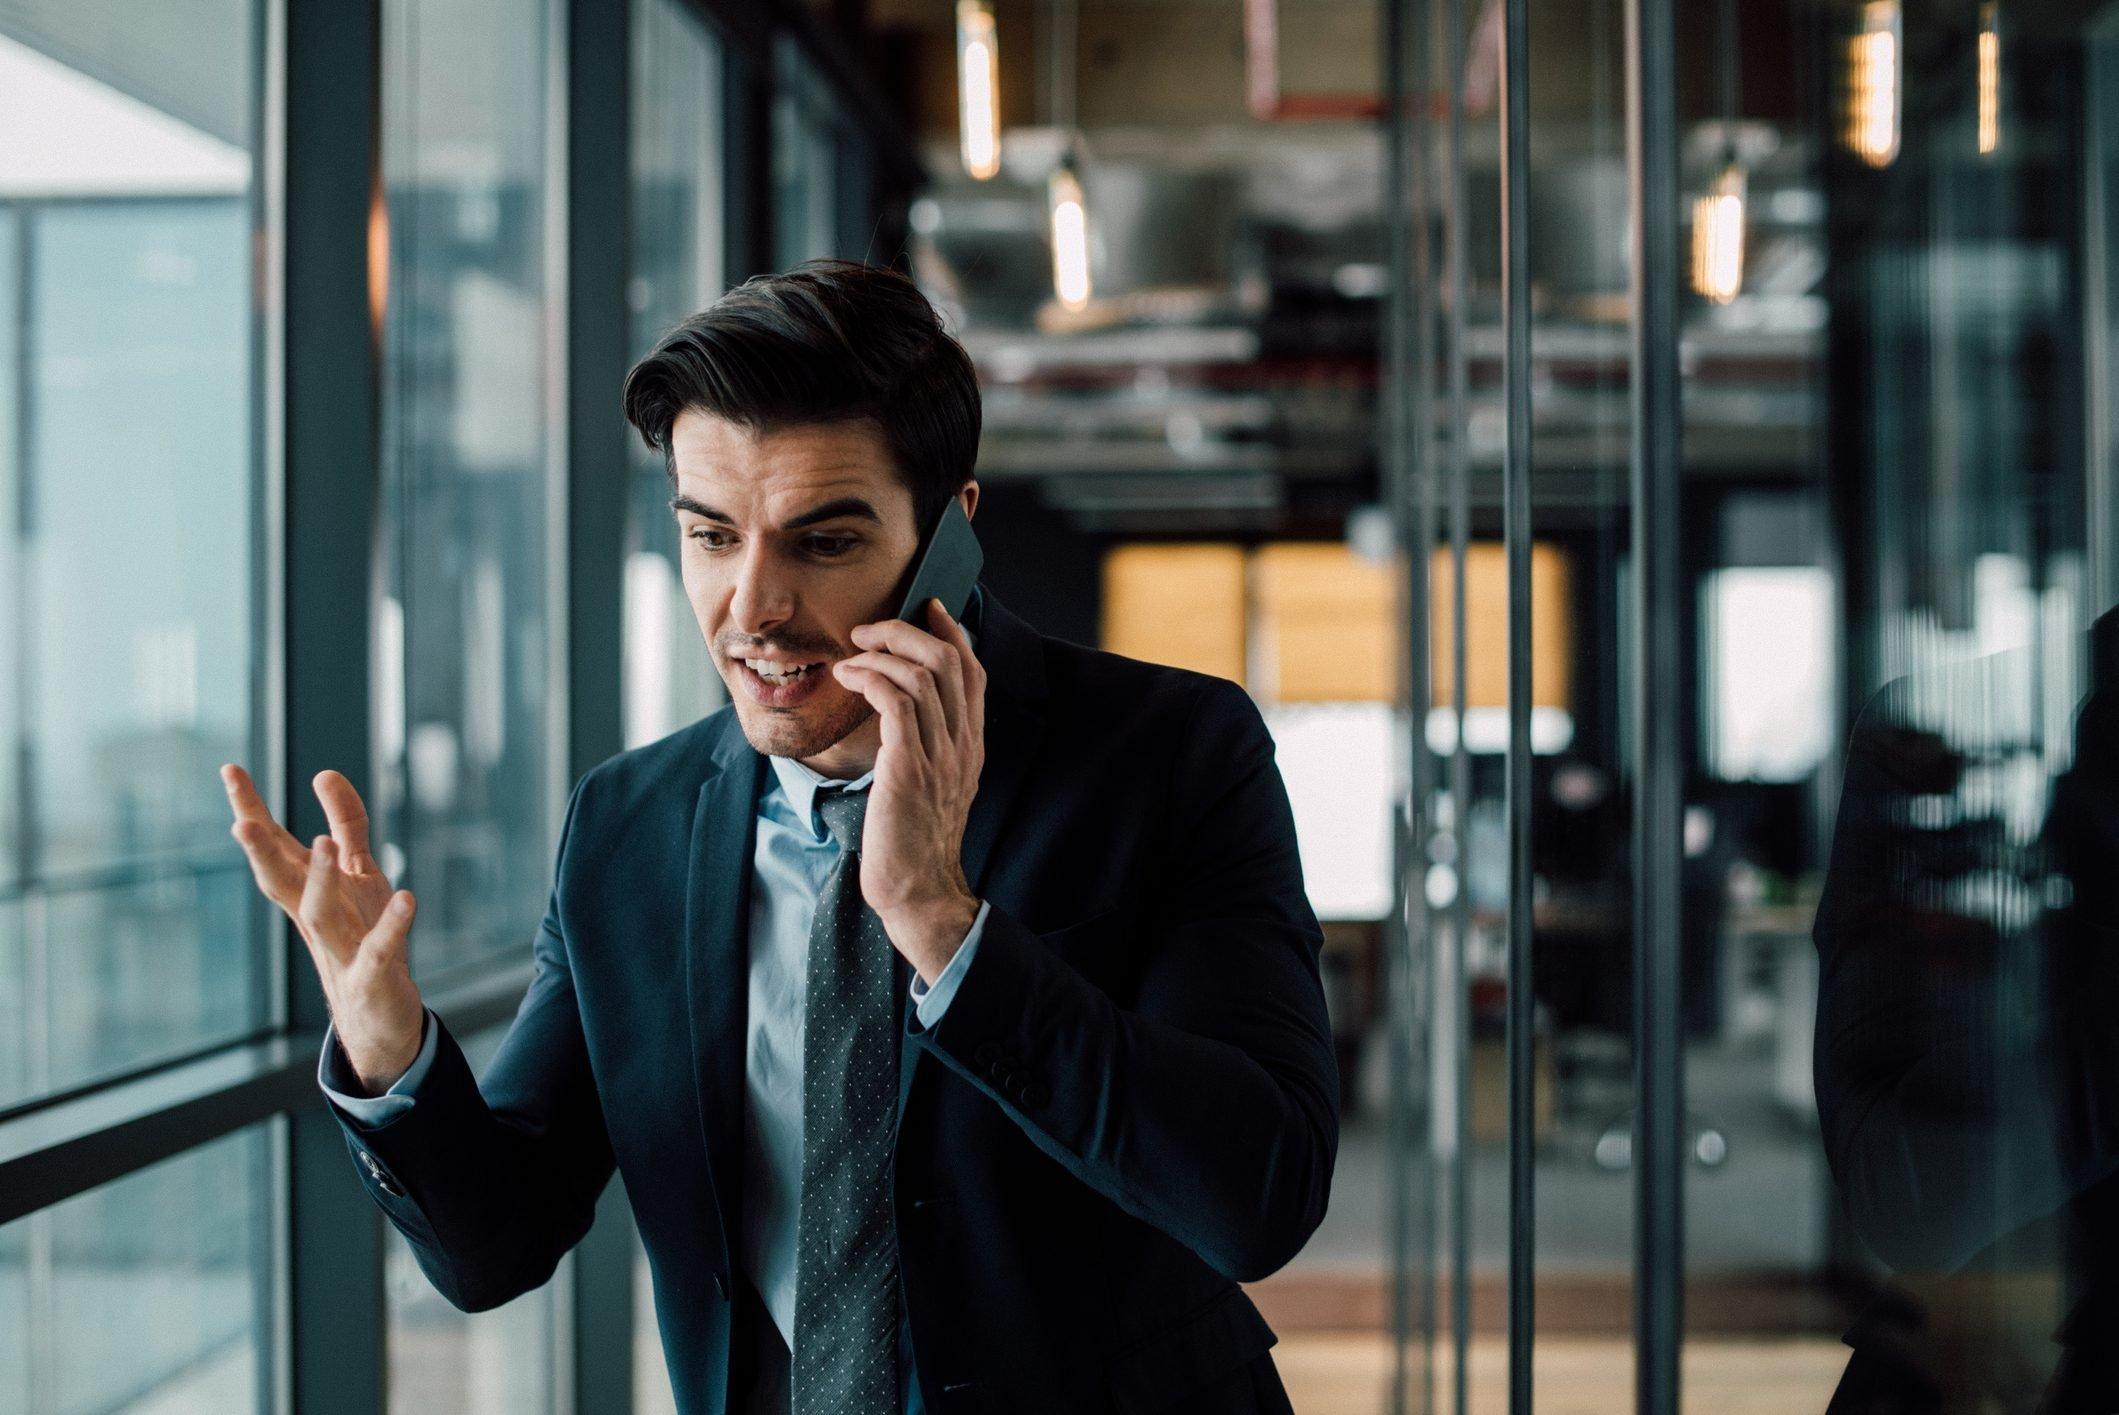 Amazed businessman annoyed with phone call